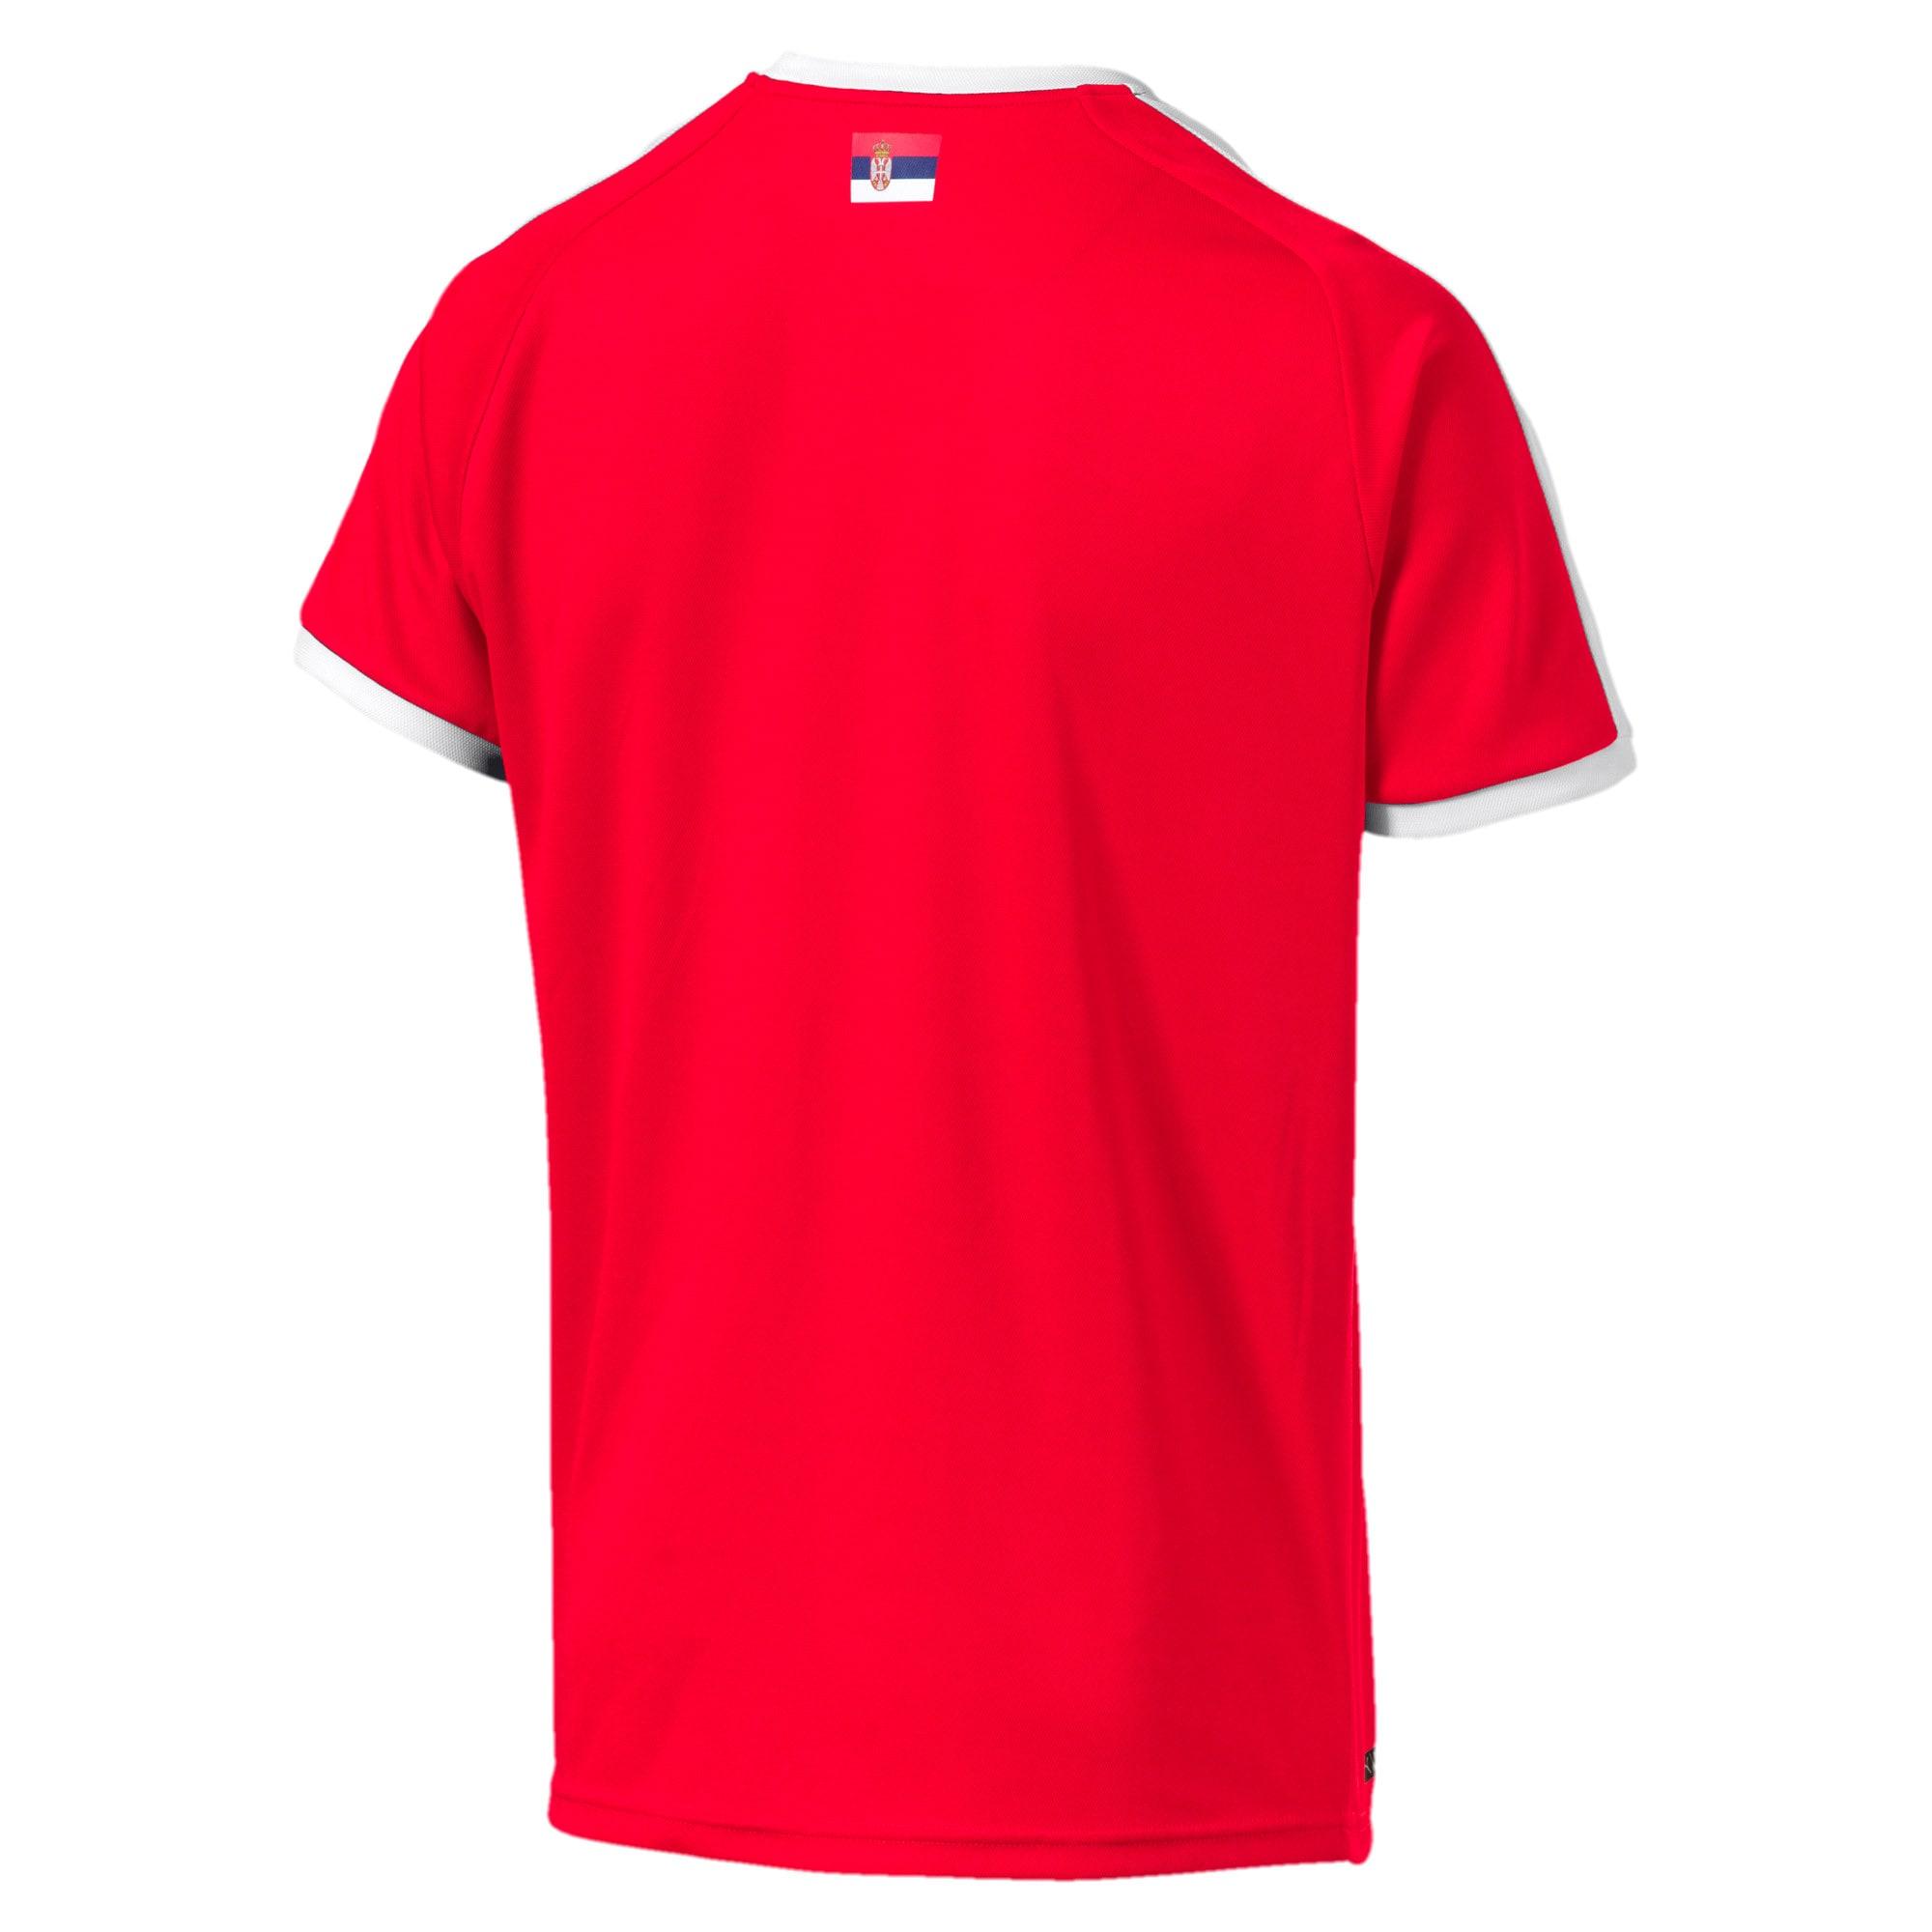 Thumbnail 2 of Serbia Home Shirt, Puma Red-Puma White, medium